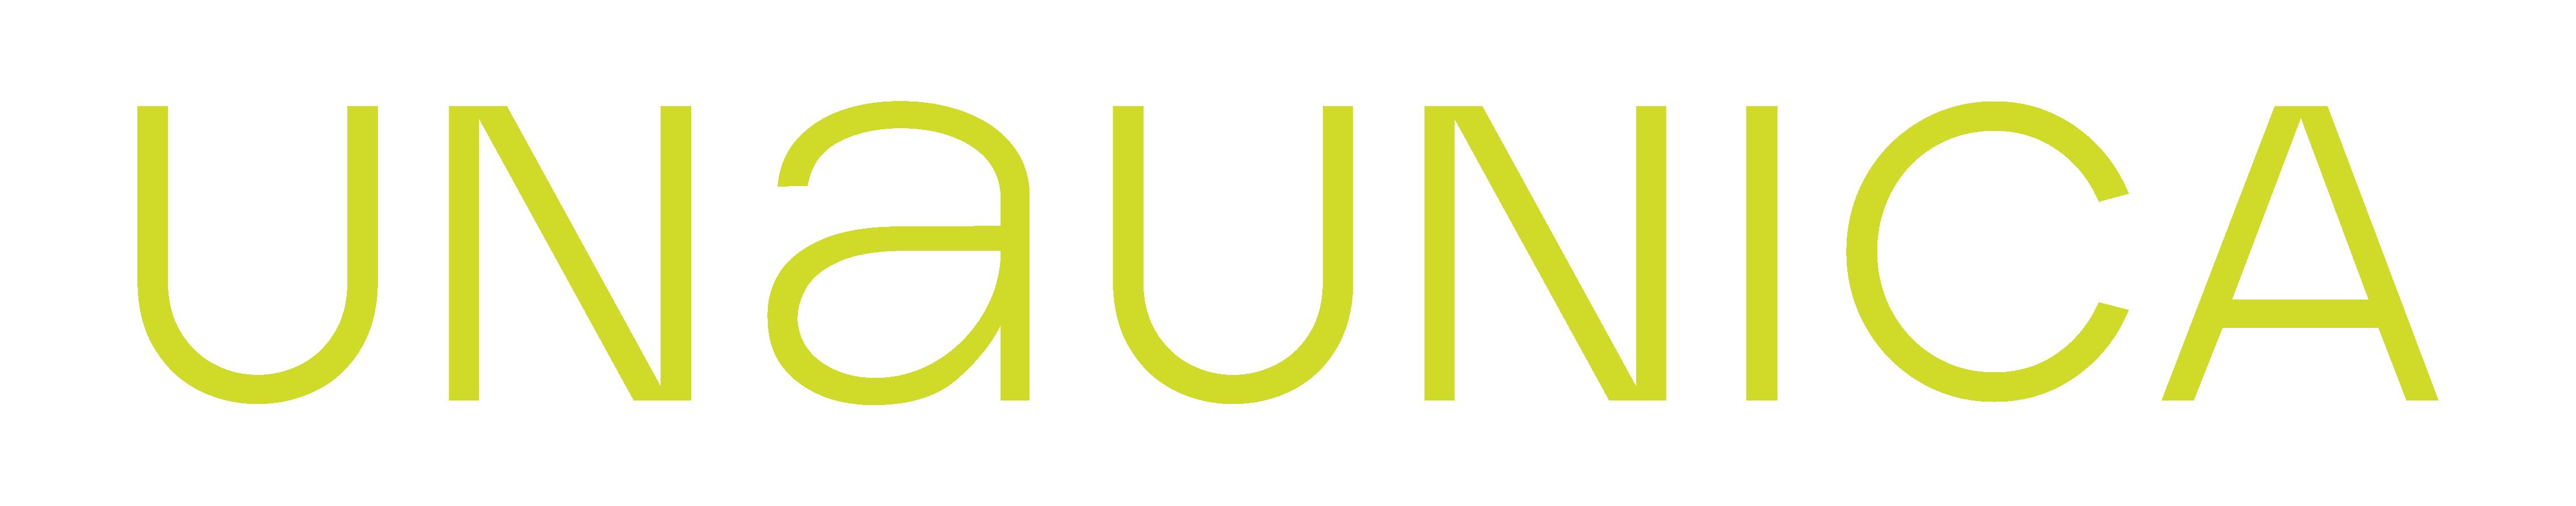 Unaunica